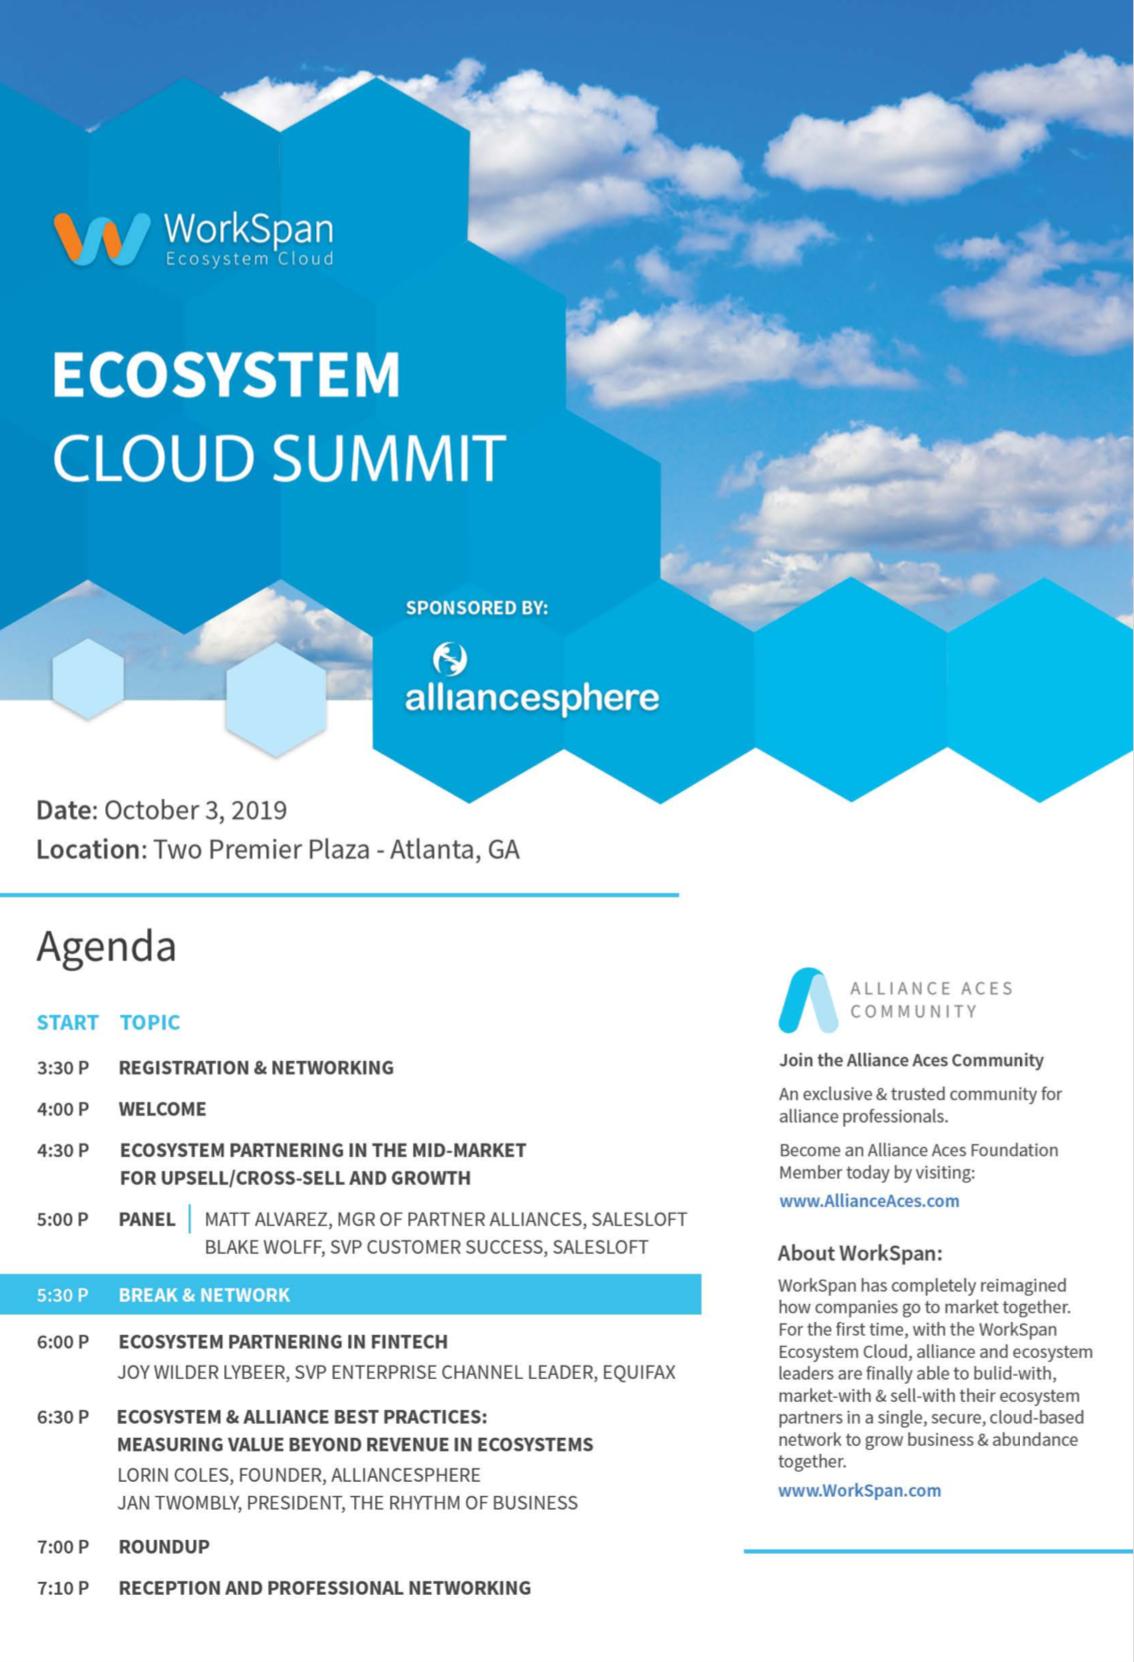 Ecosystem Cloud Summit Atlanta Agenda Image